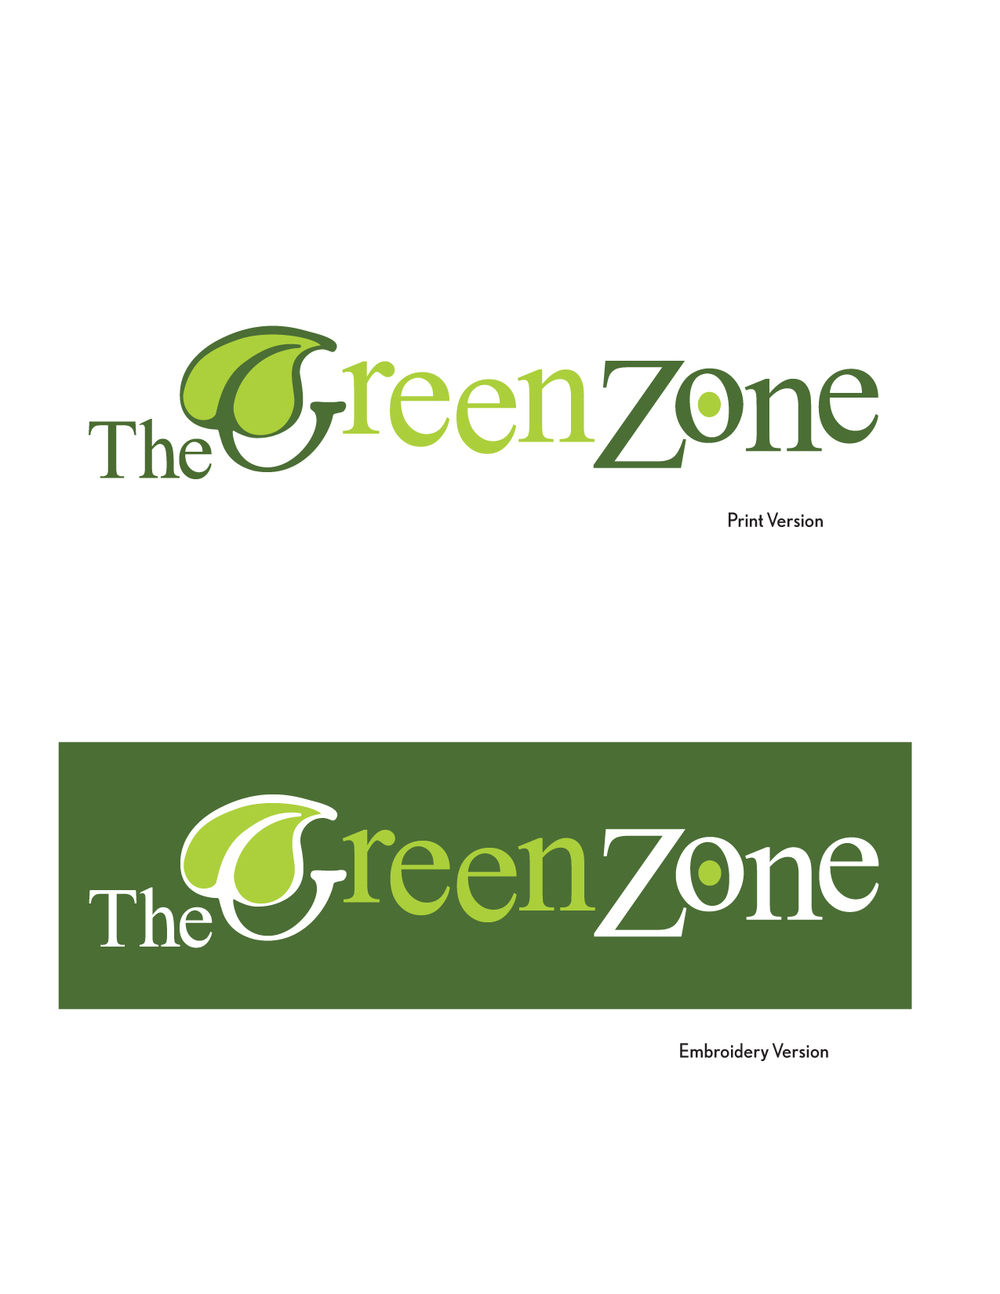 TheGreenZoneLogosFNL.jpg